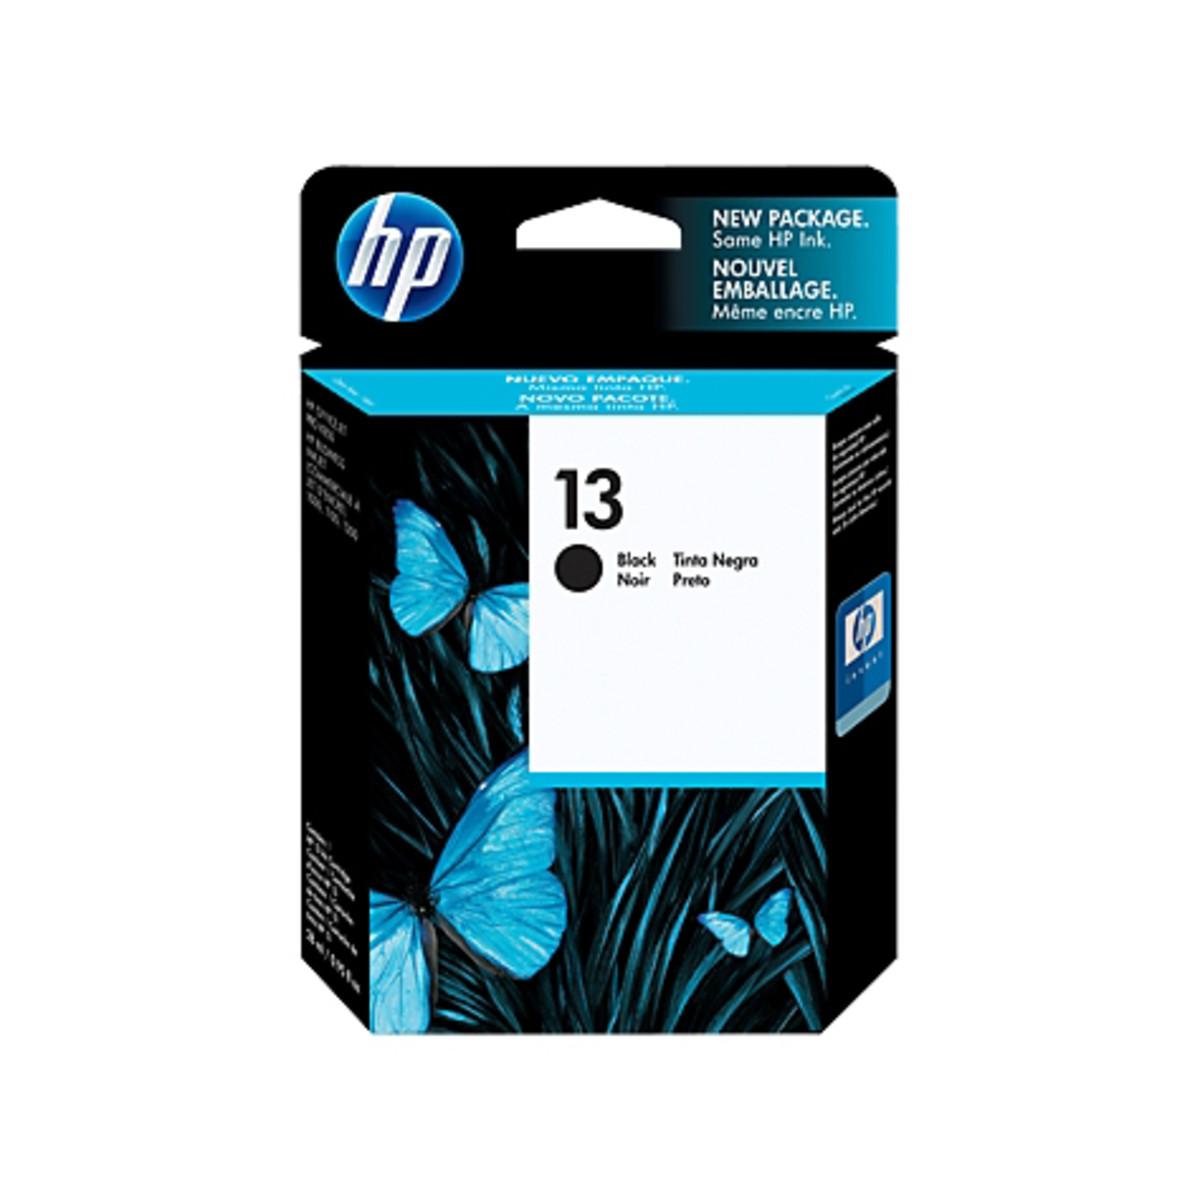 HP 13 (C4814A) Black Ink Cartridge